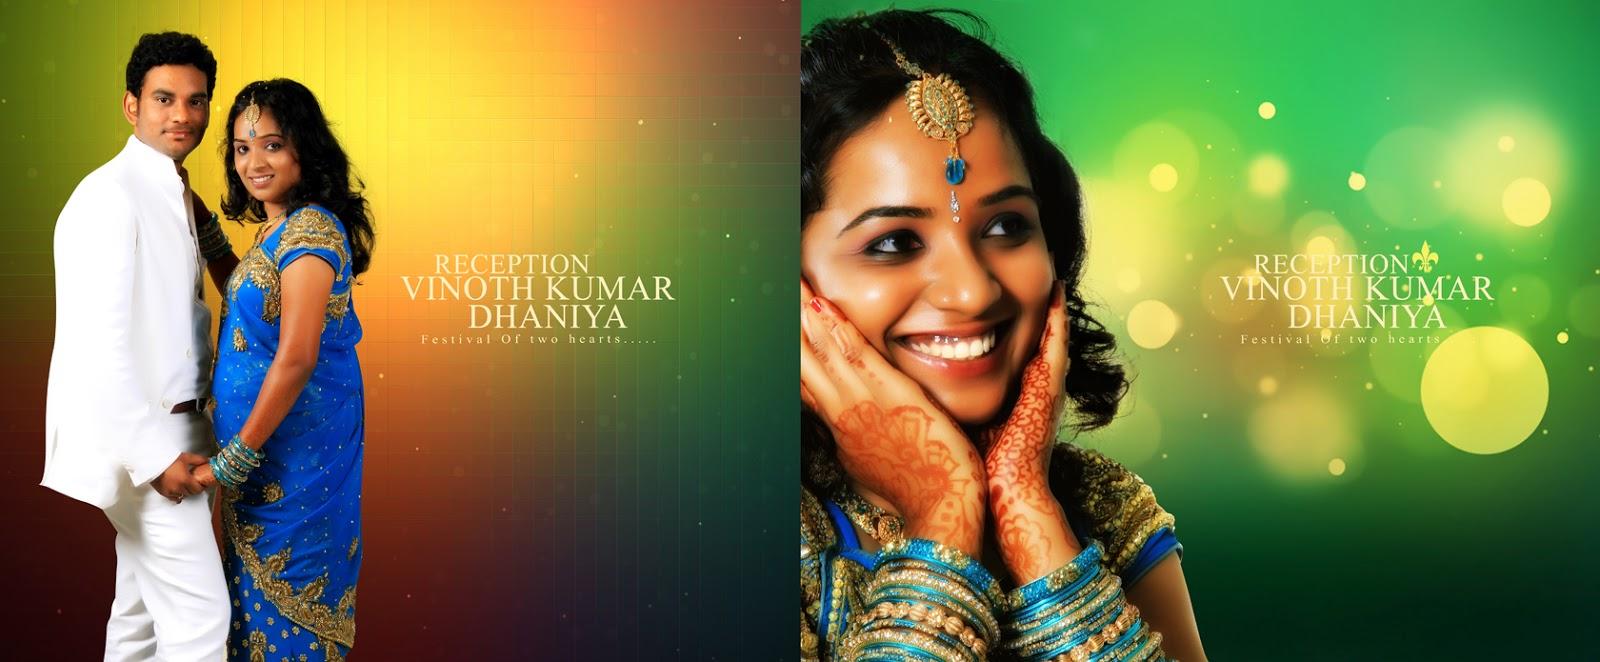 chennai wedding album designing service all nations excellent